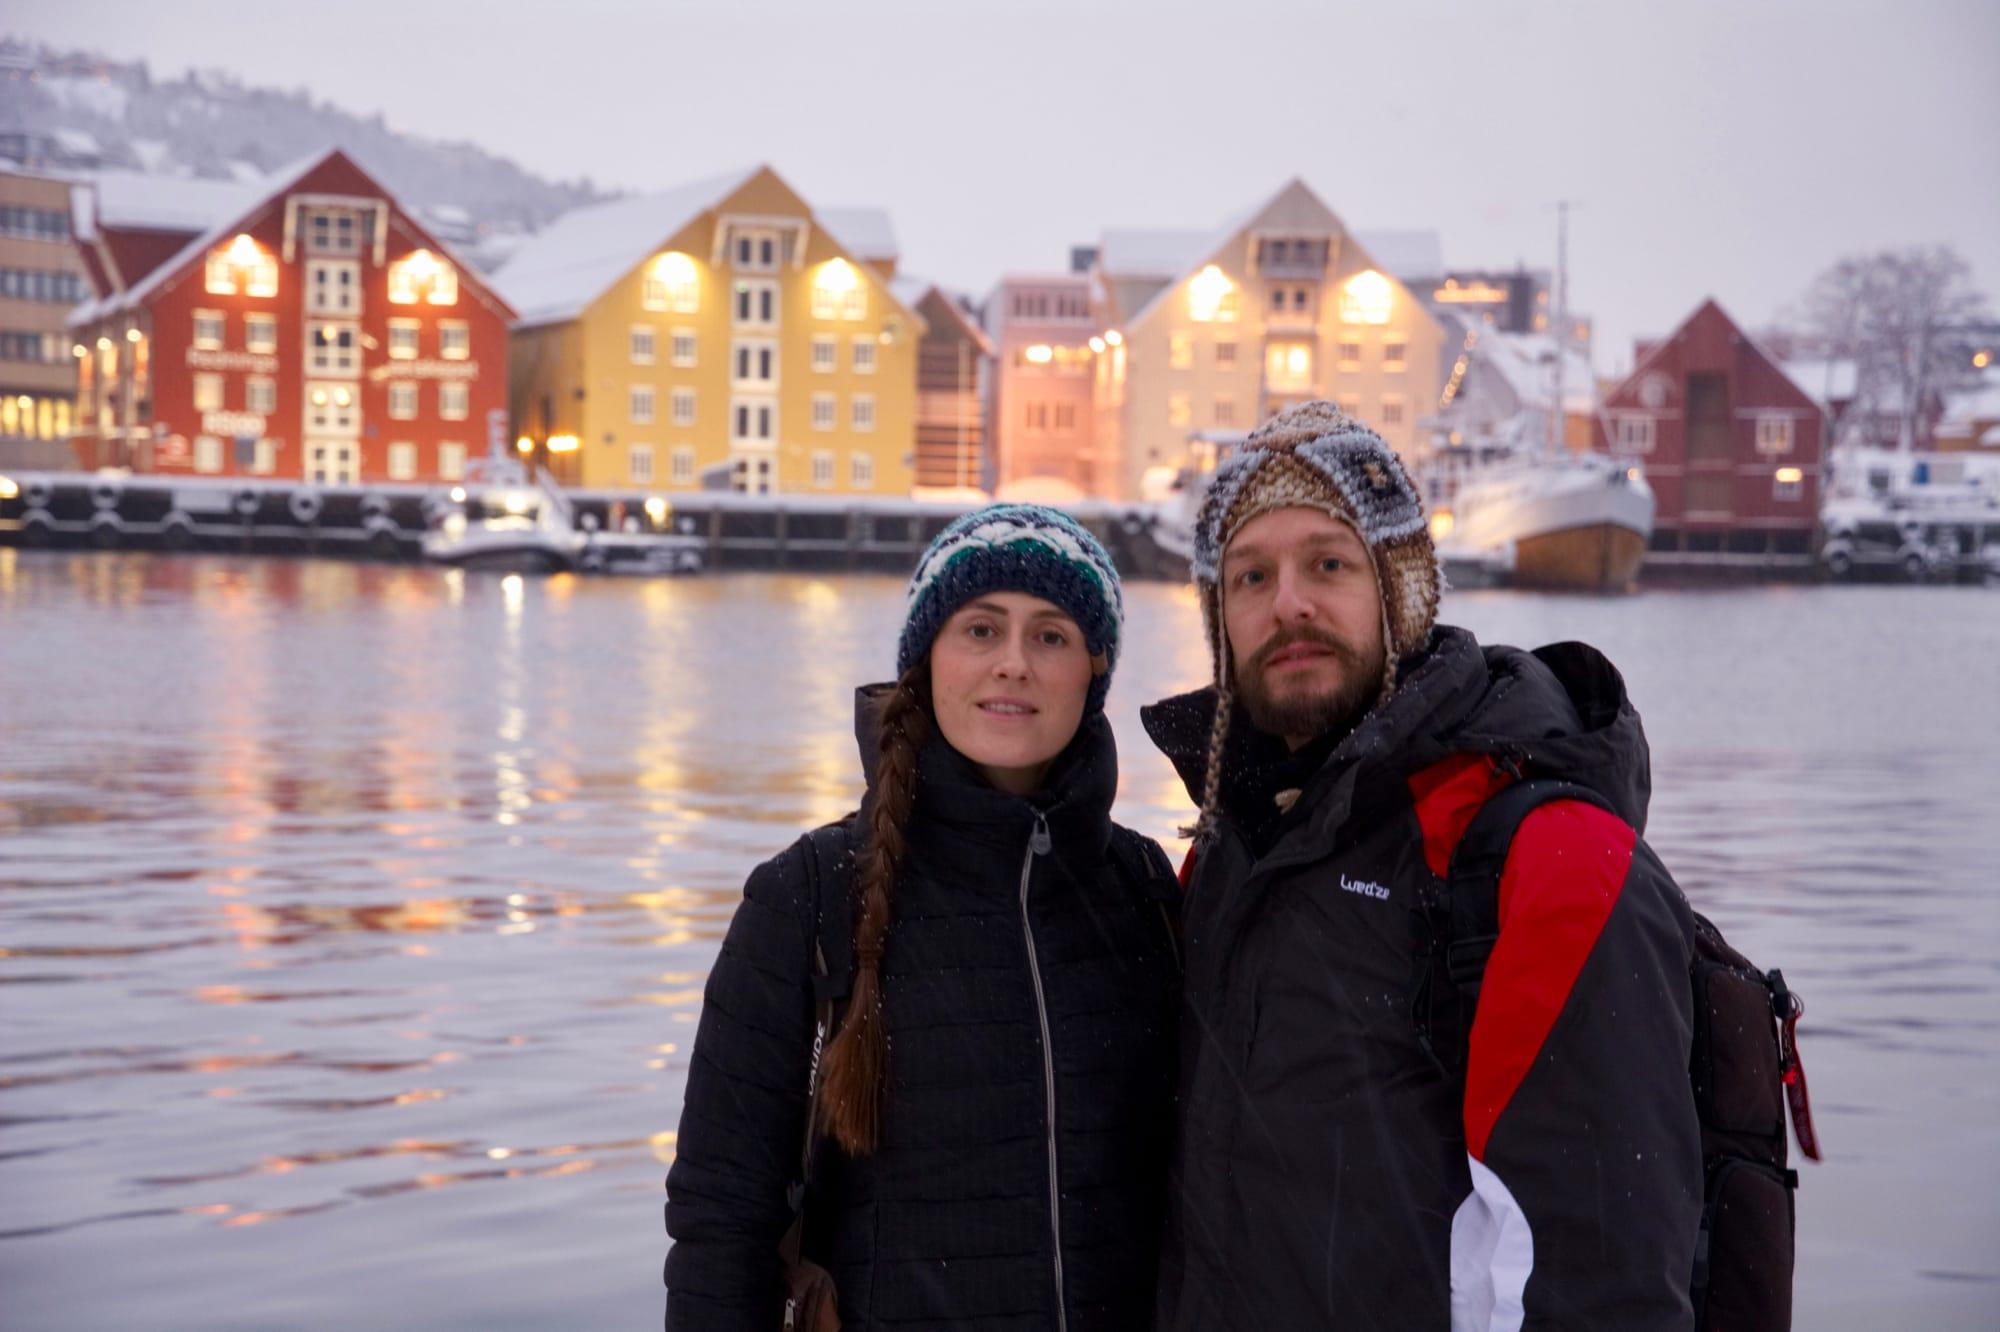 Noi a Tromso